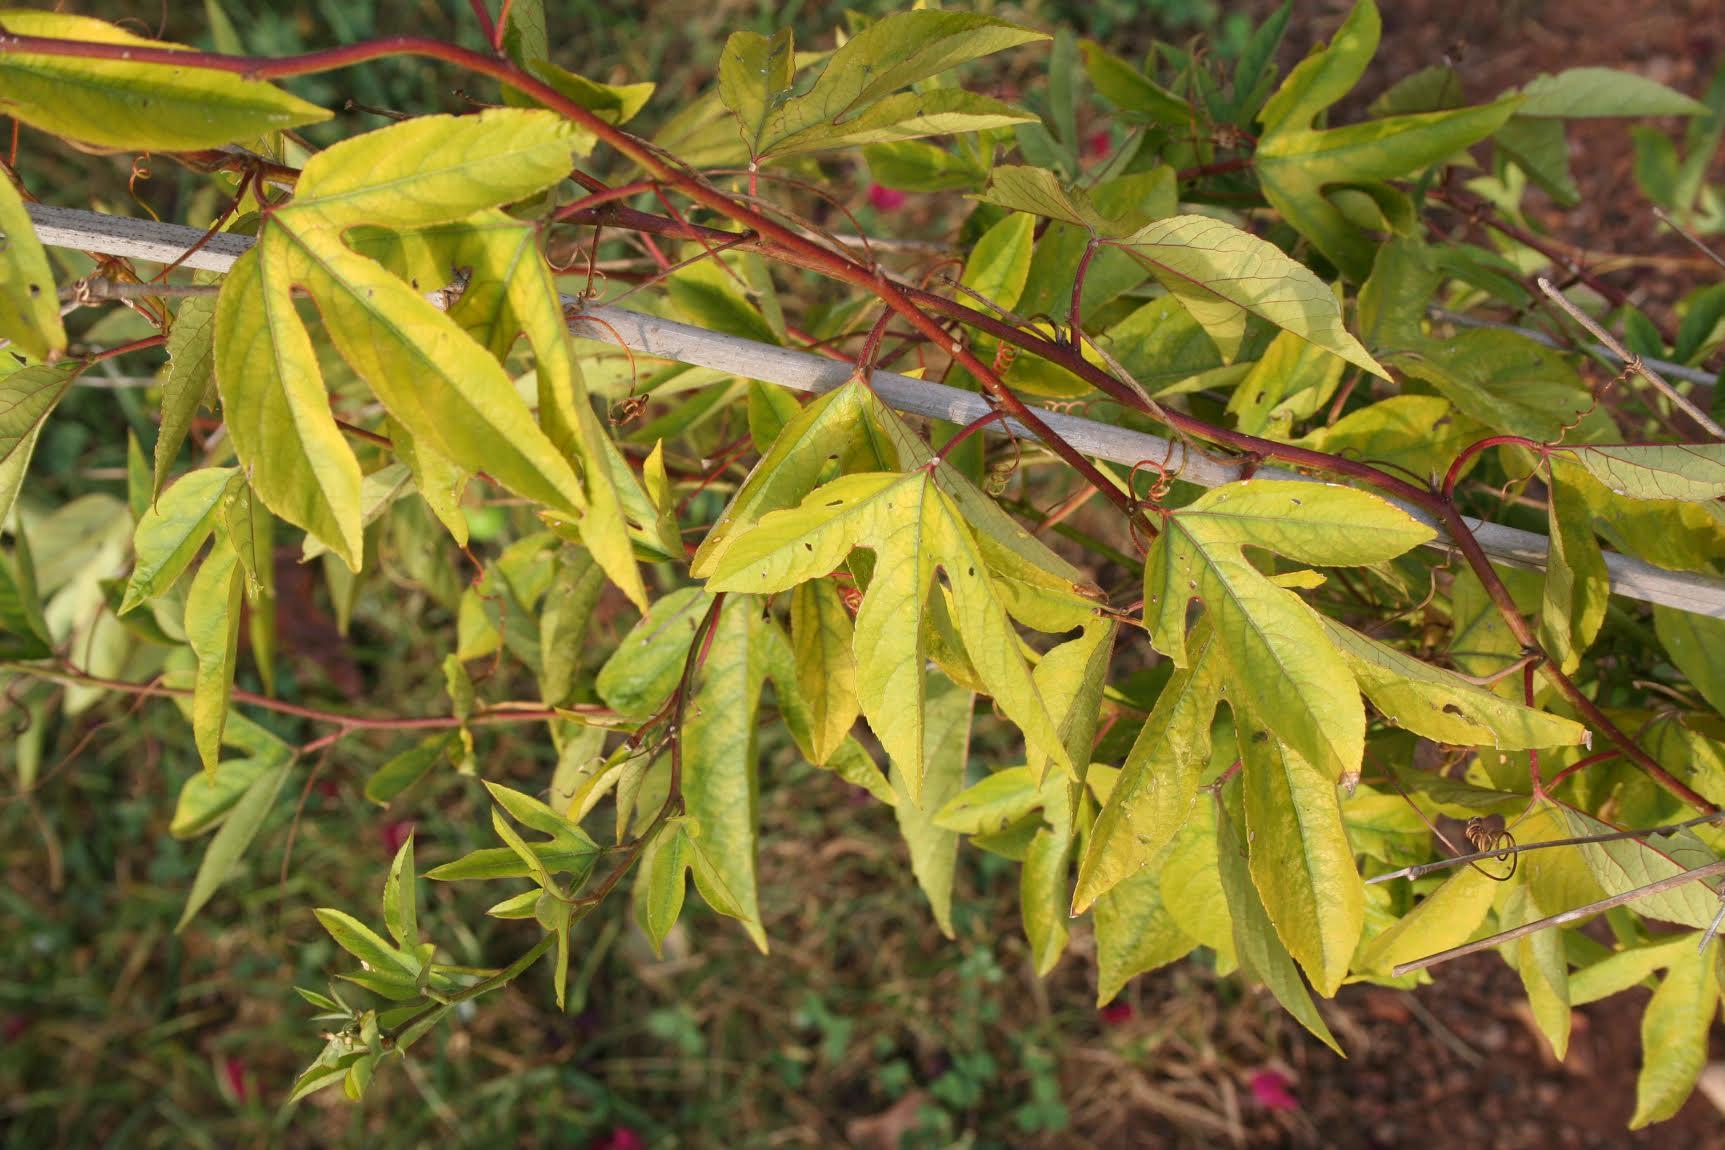 Passion Flower Vine Diseases Treating Passion Flower Vine Problems